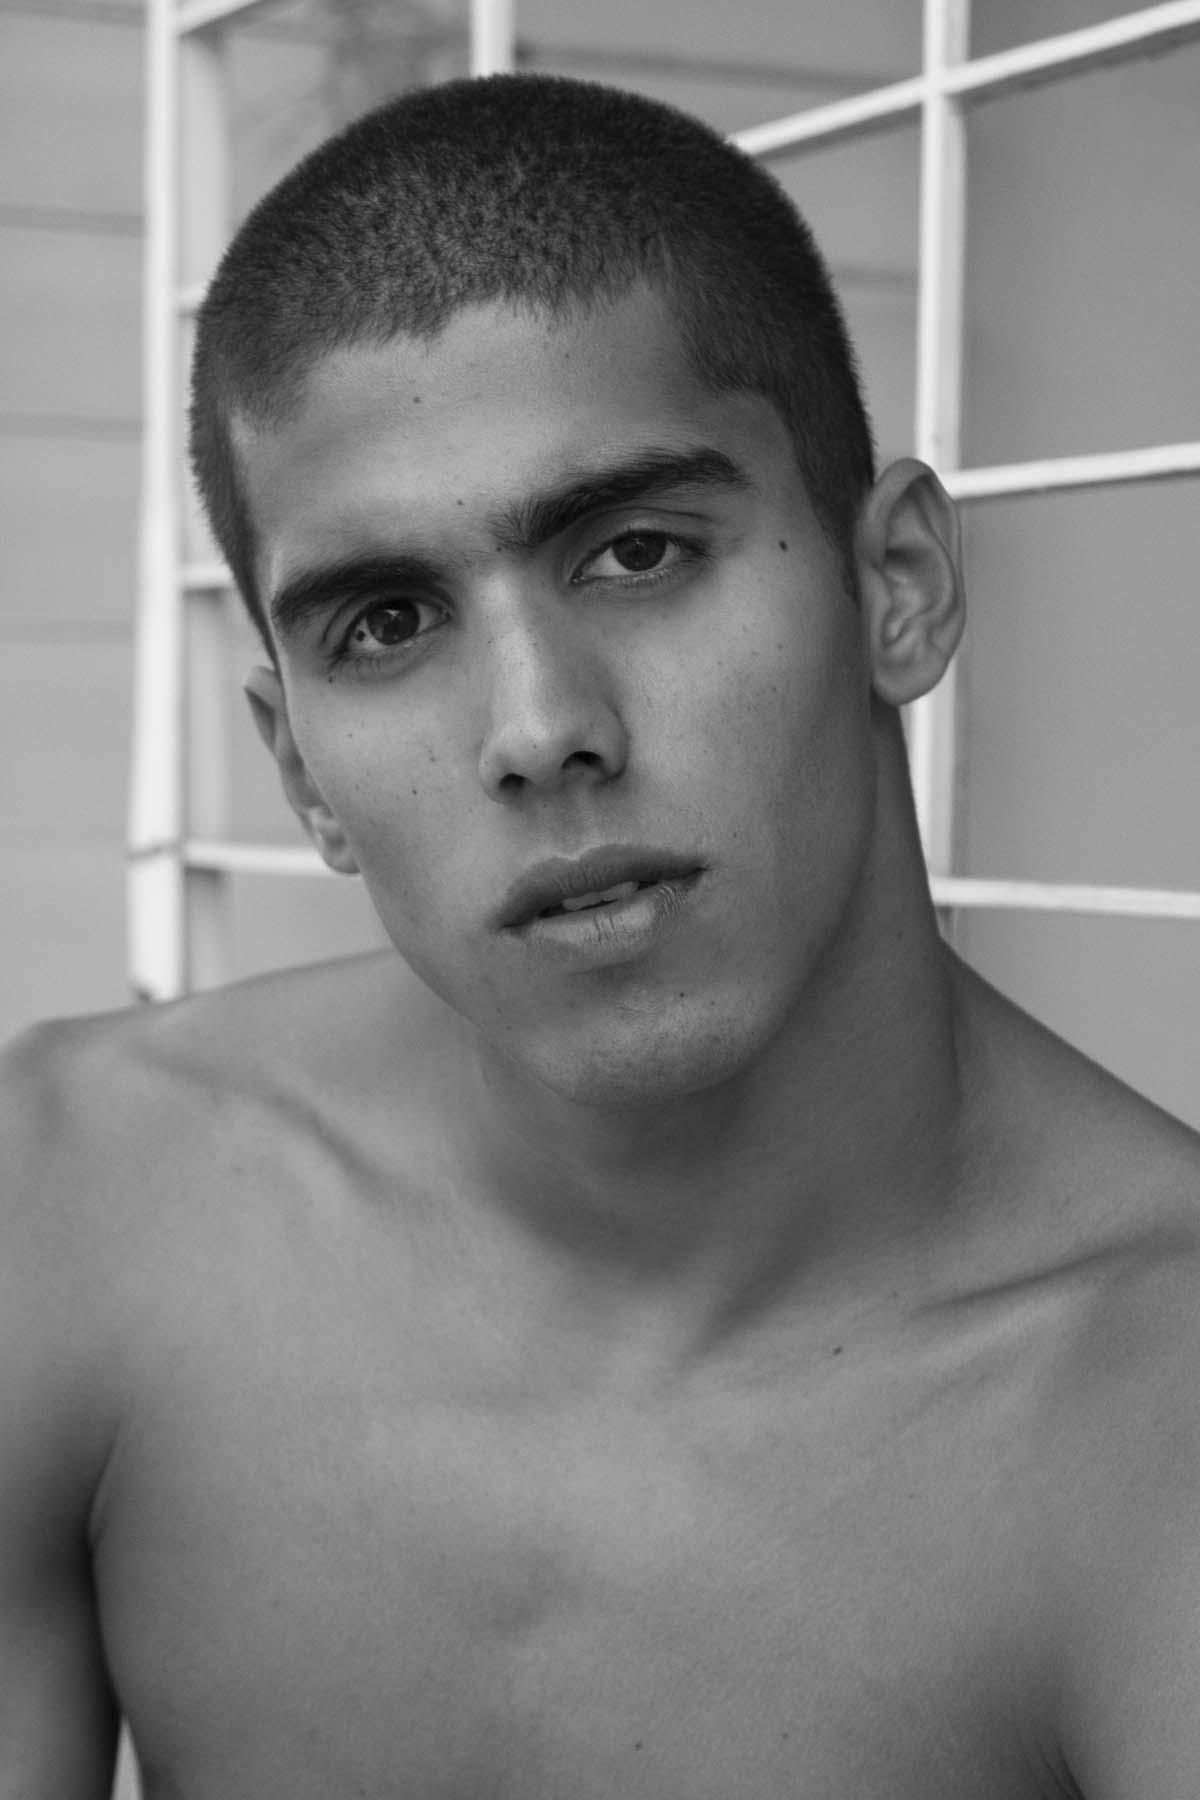 João Vitor Amaral and João Pedro Costa by Filipe Galgani for Brazilian Male Model